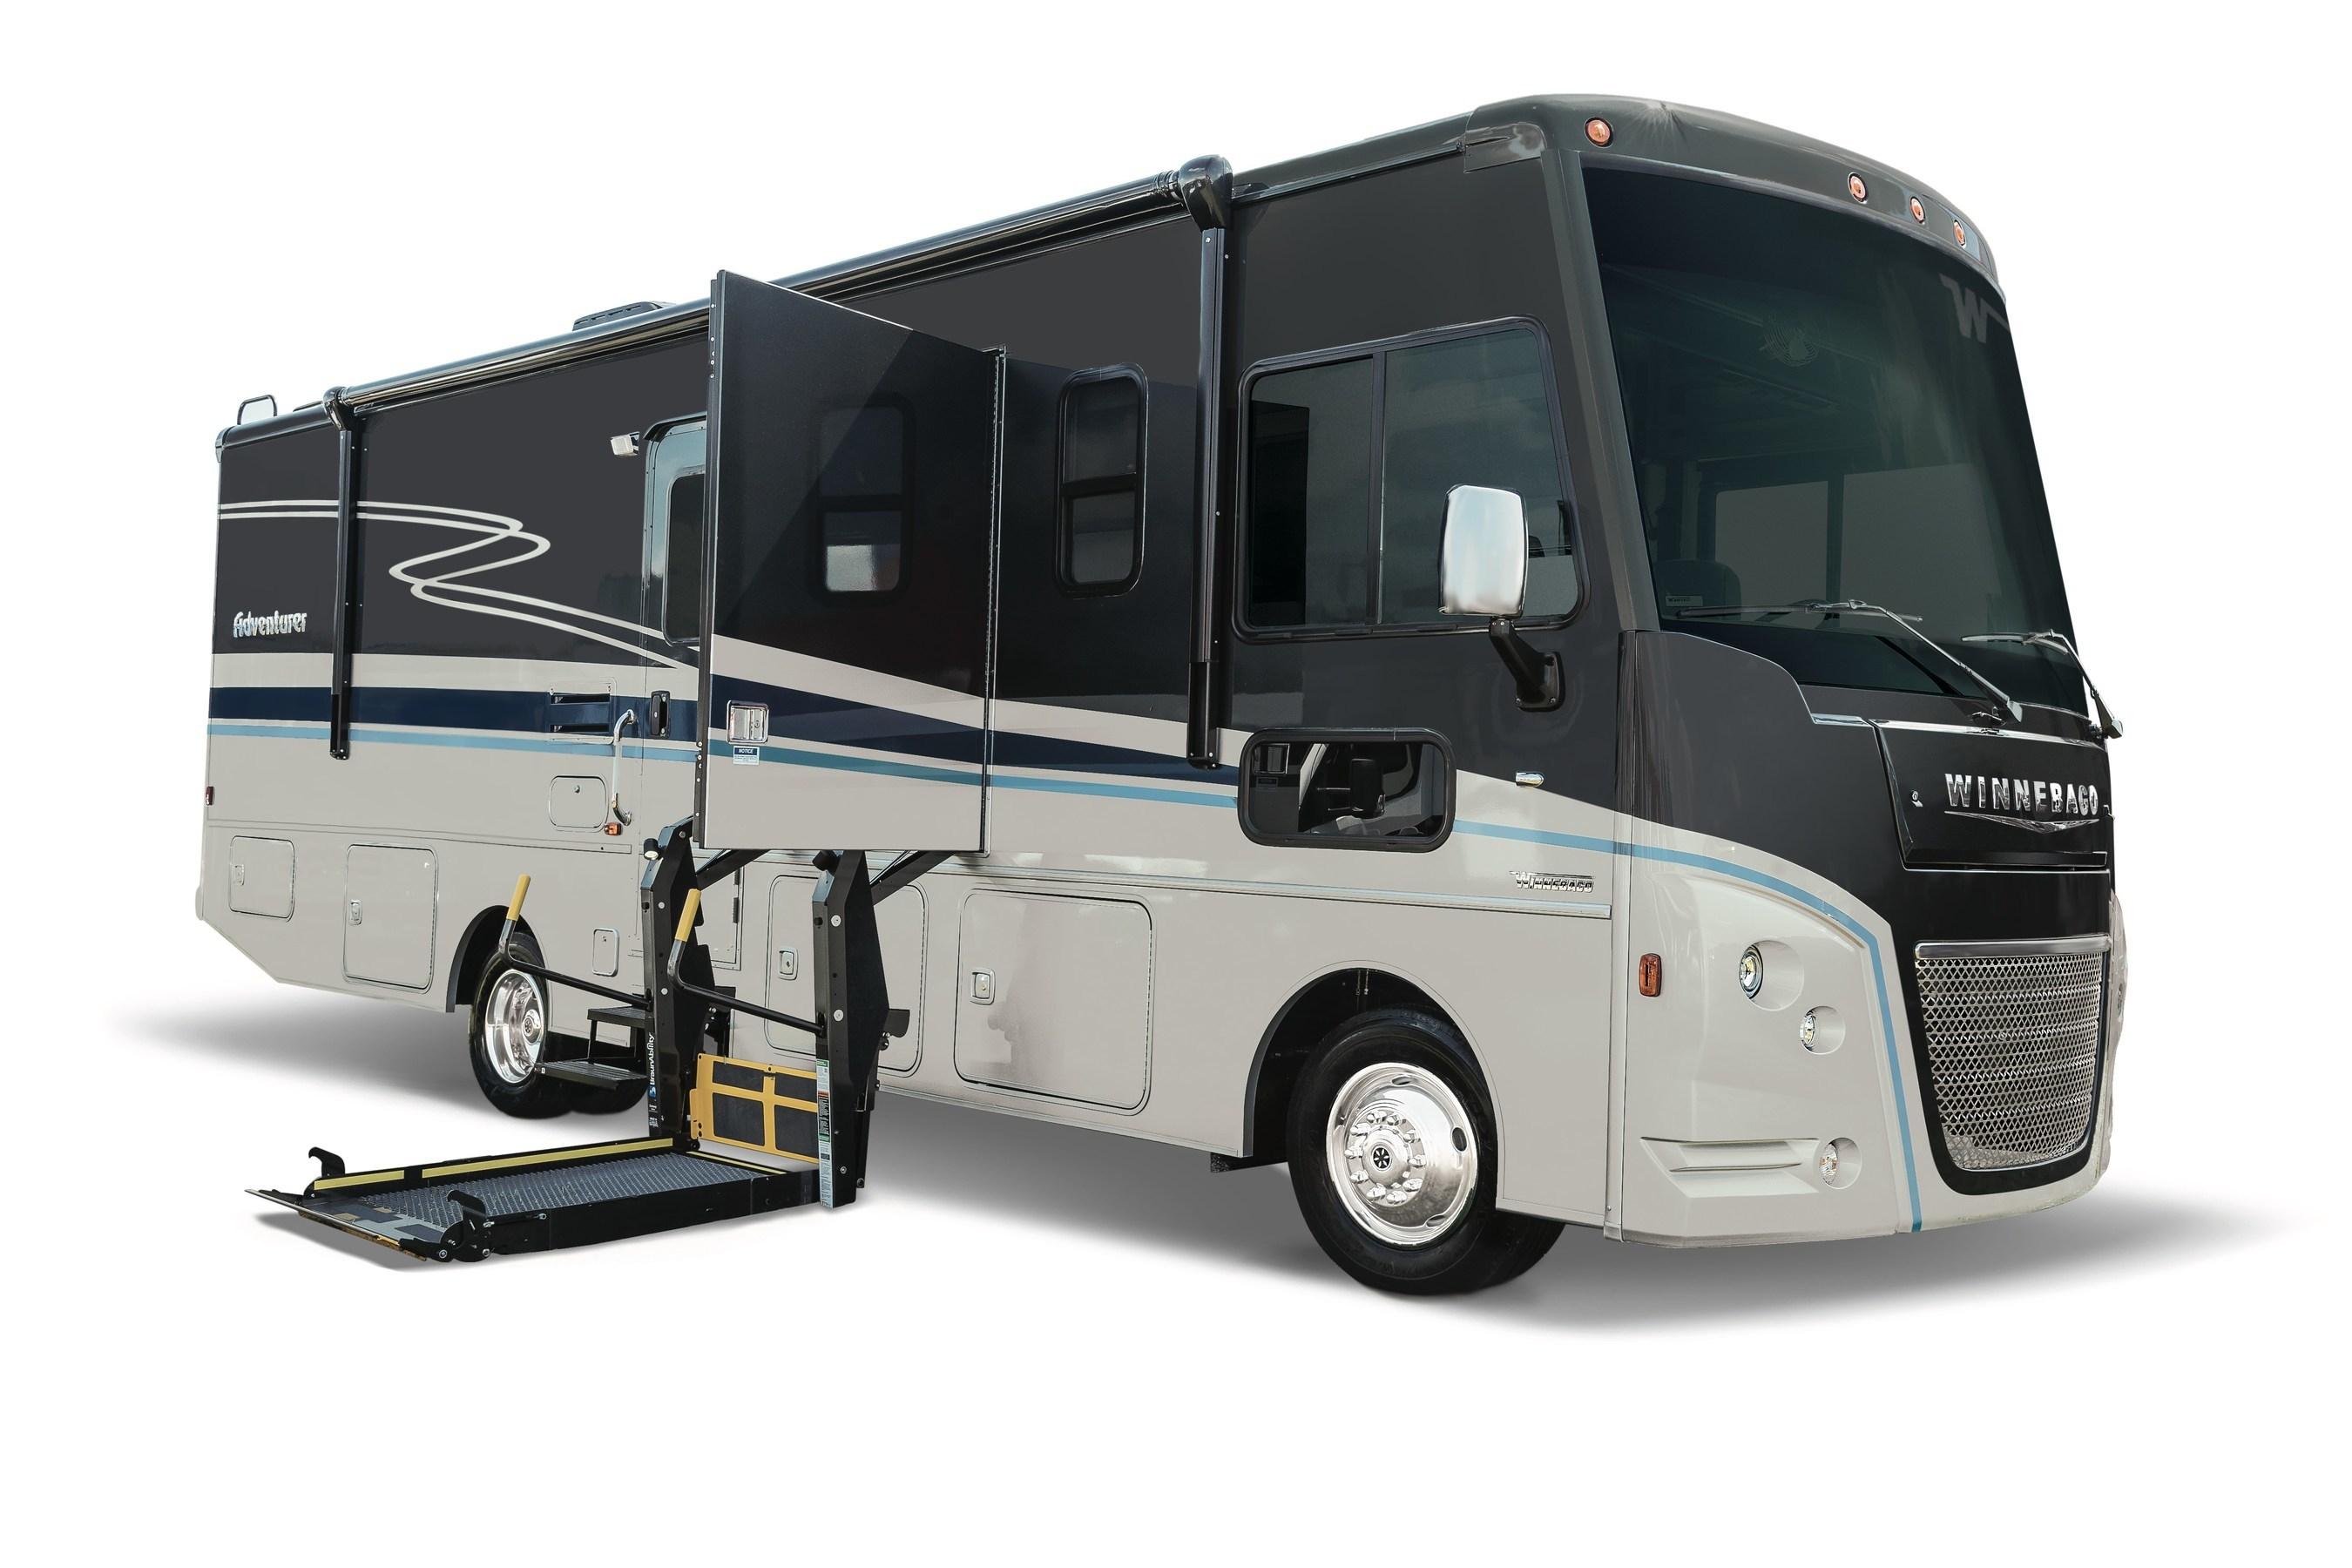 Winnebago Reveals 2020 Wheelchair-Ready Motorhomes and New